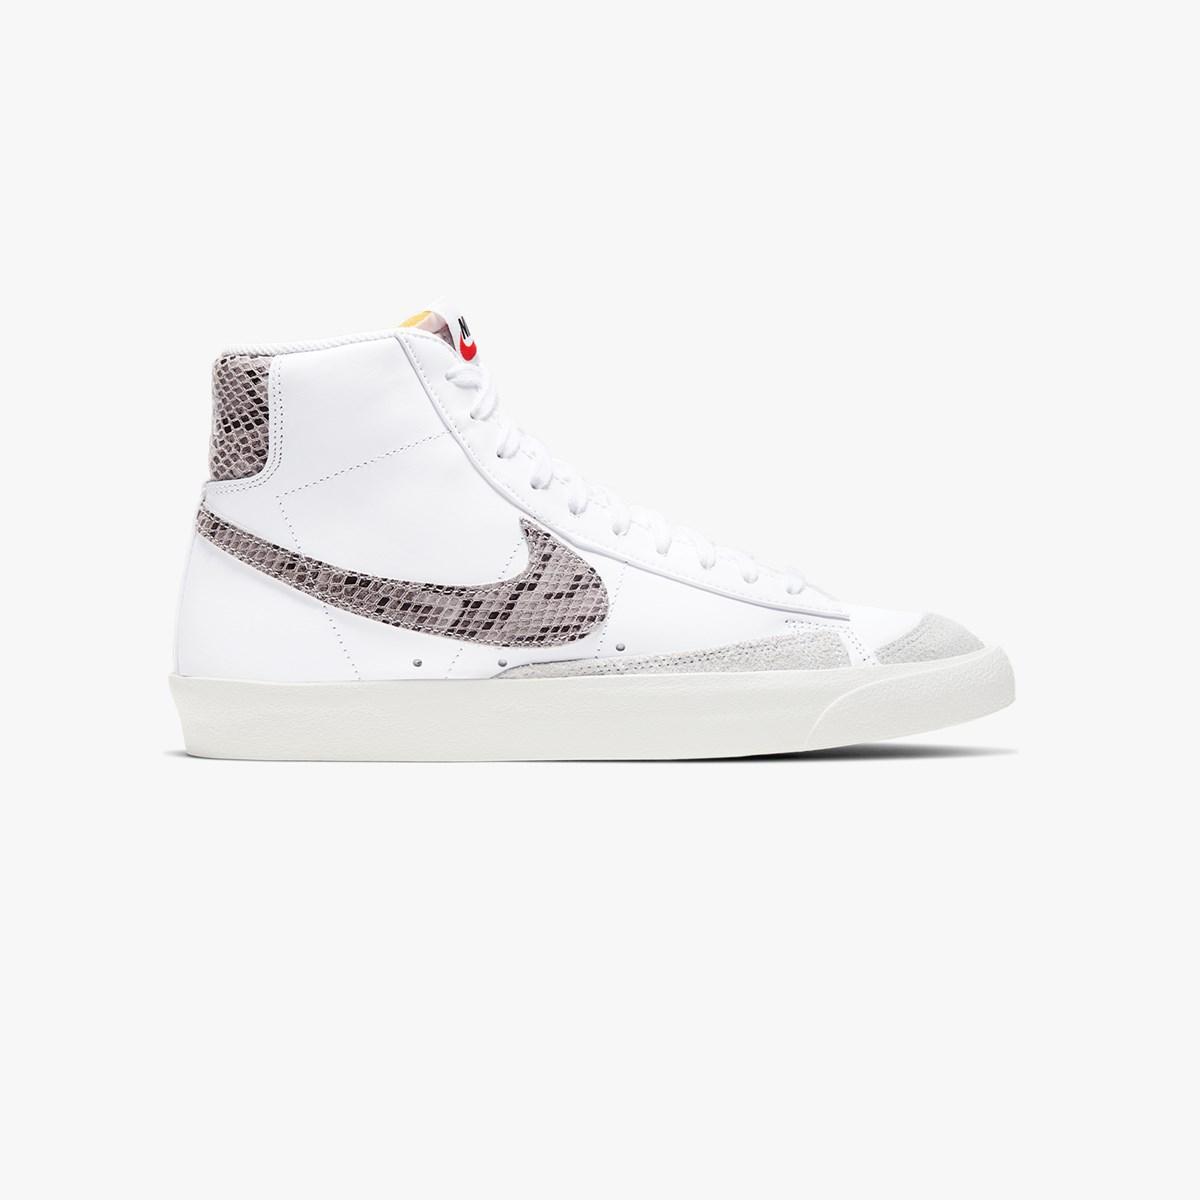 Nike Blazer Mid 77 VNTG Reptile - Ci1176-101 - SNS   sneakers & streetwear en ligne depuis 1999